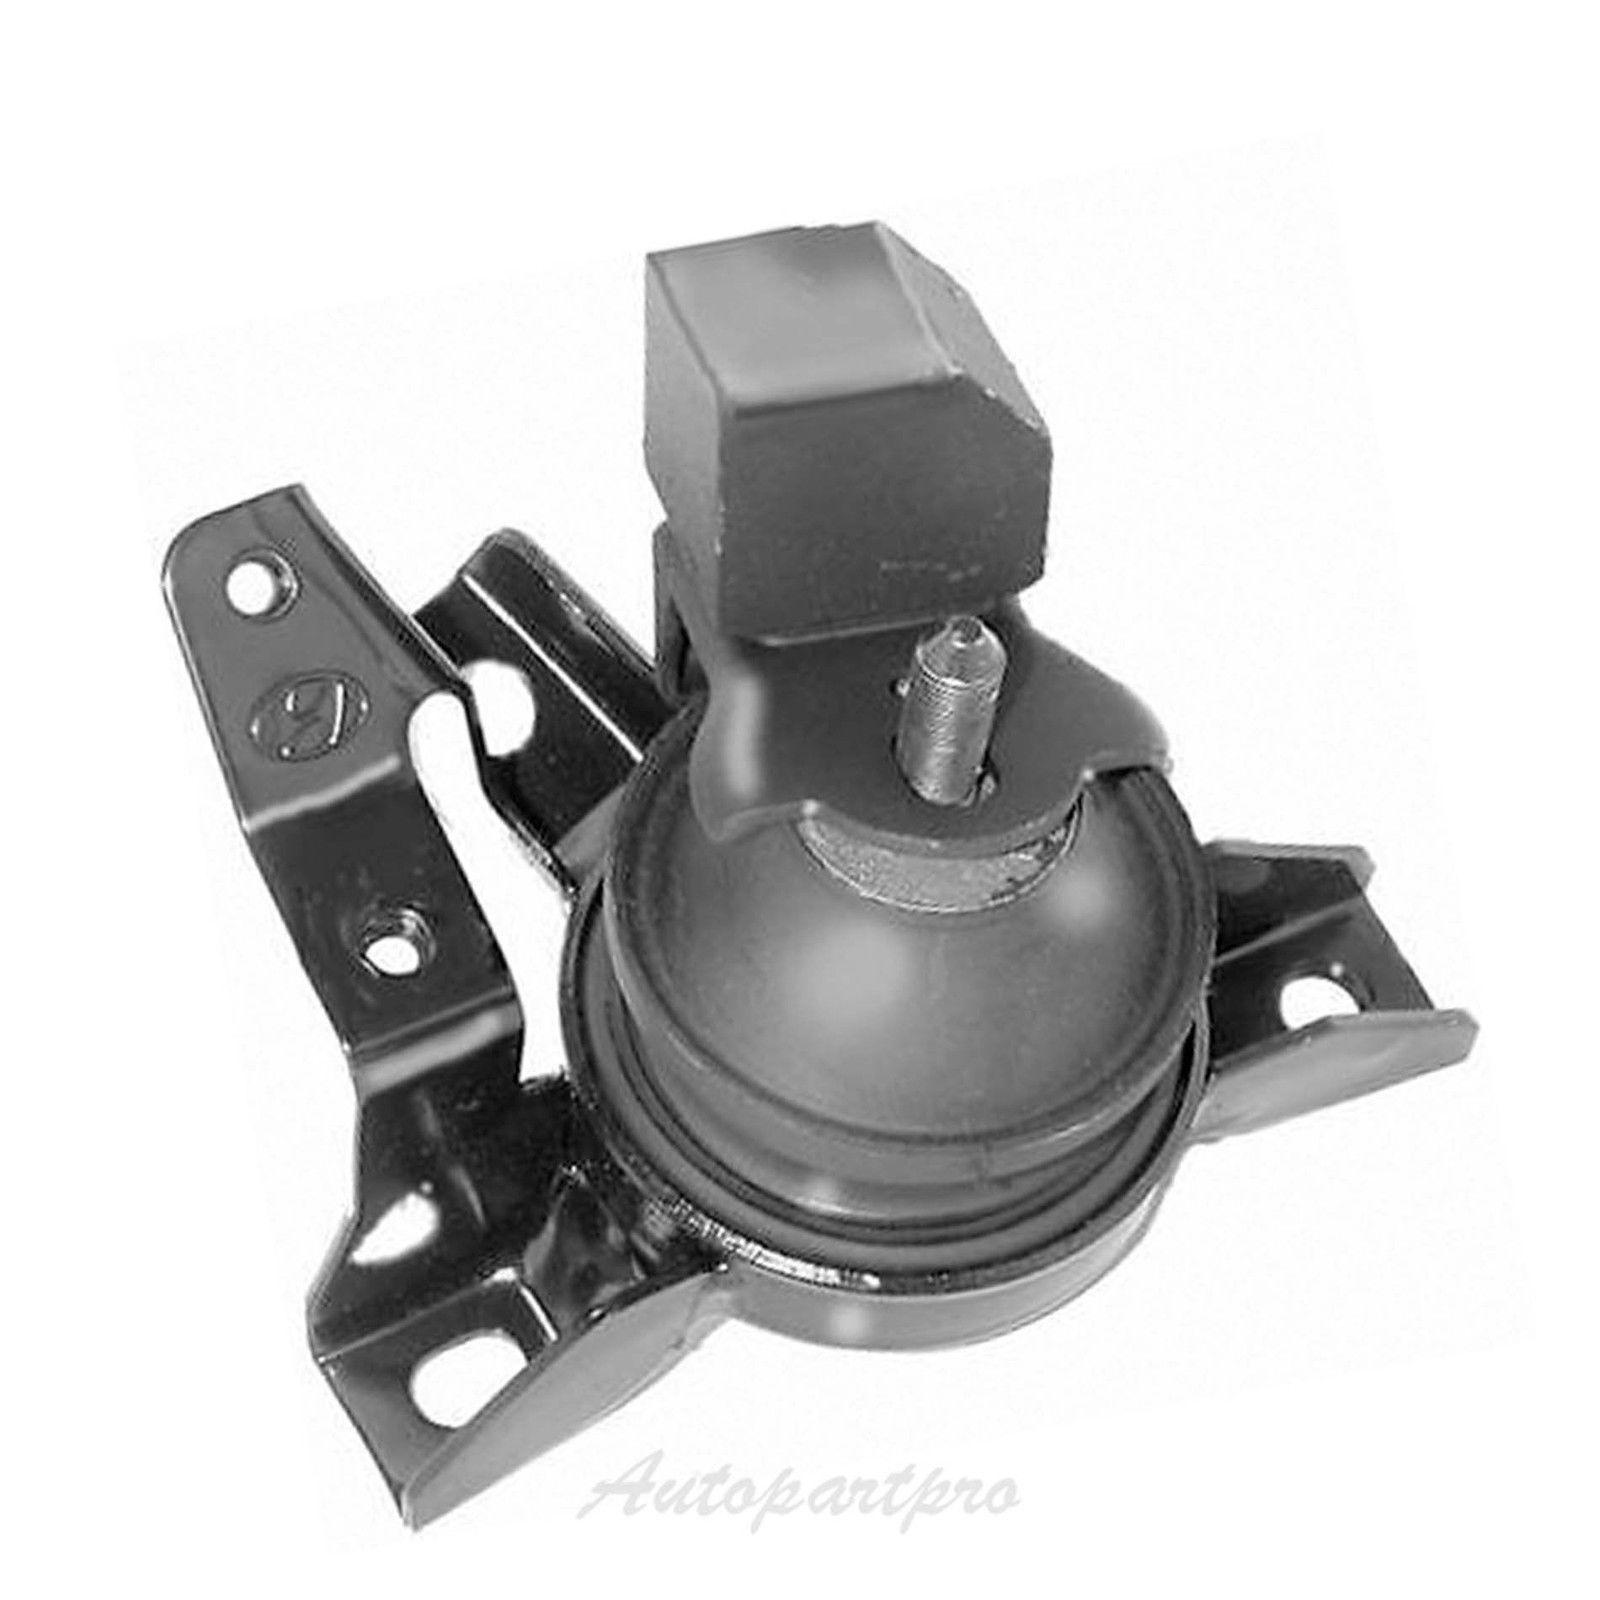 Engine Motor Mount Set 3PCS for 2001-2006 Hyundai Santa Fe 2.4L 2.7L for Auto.